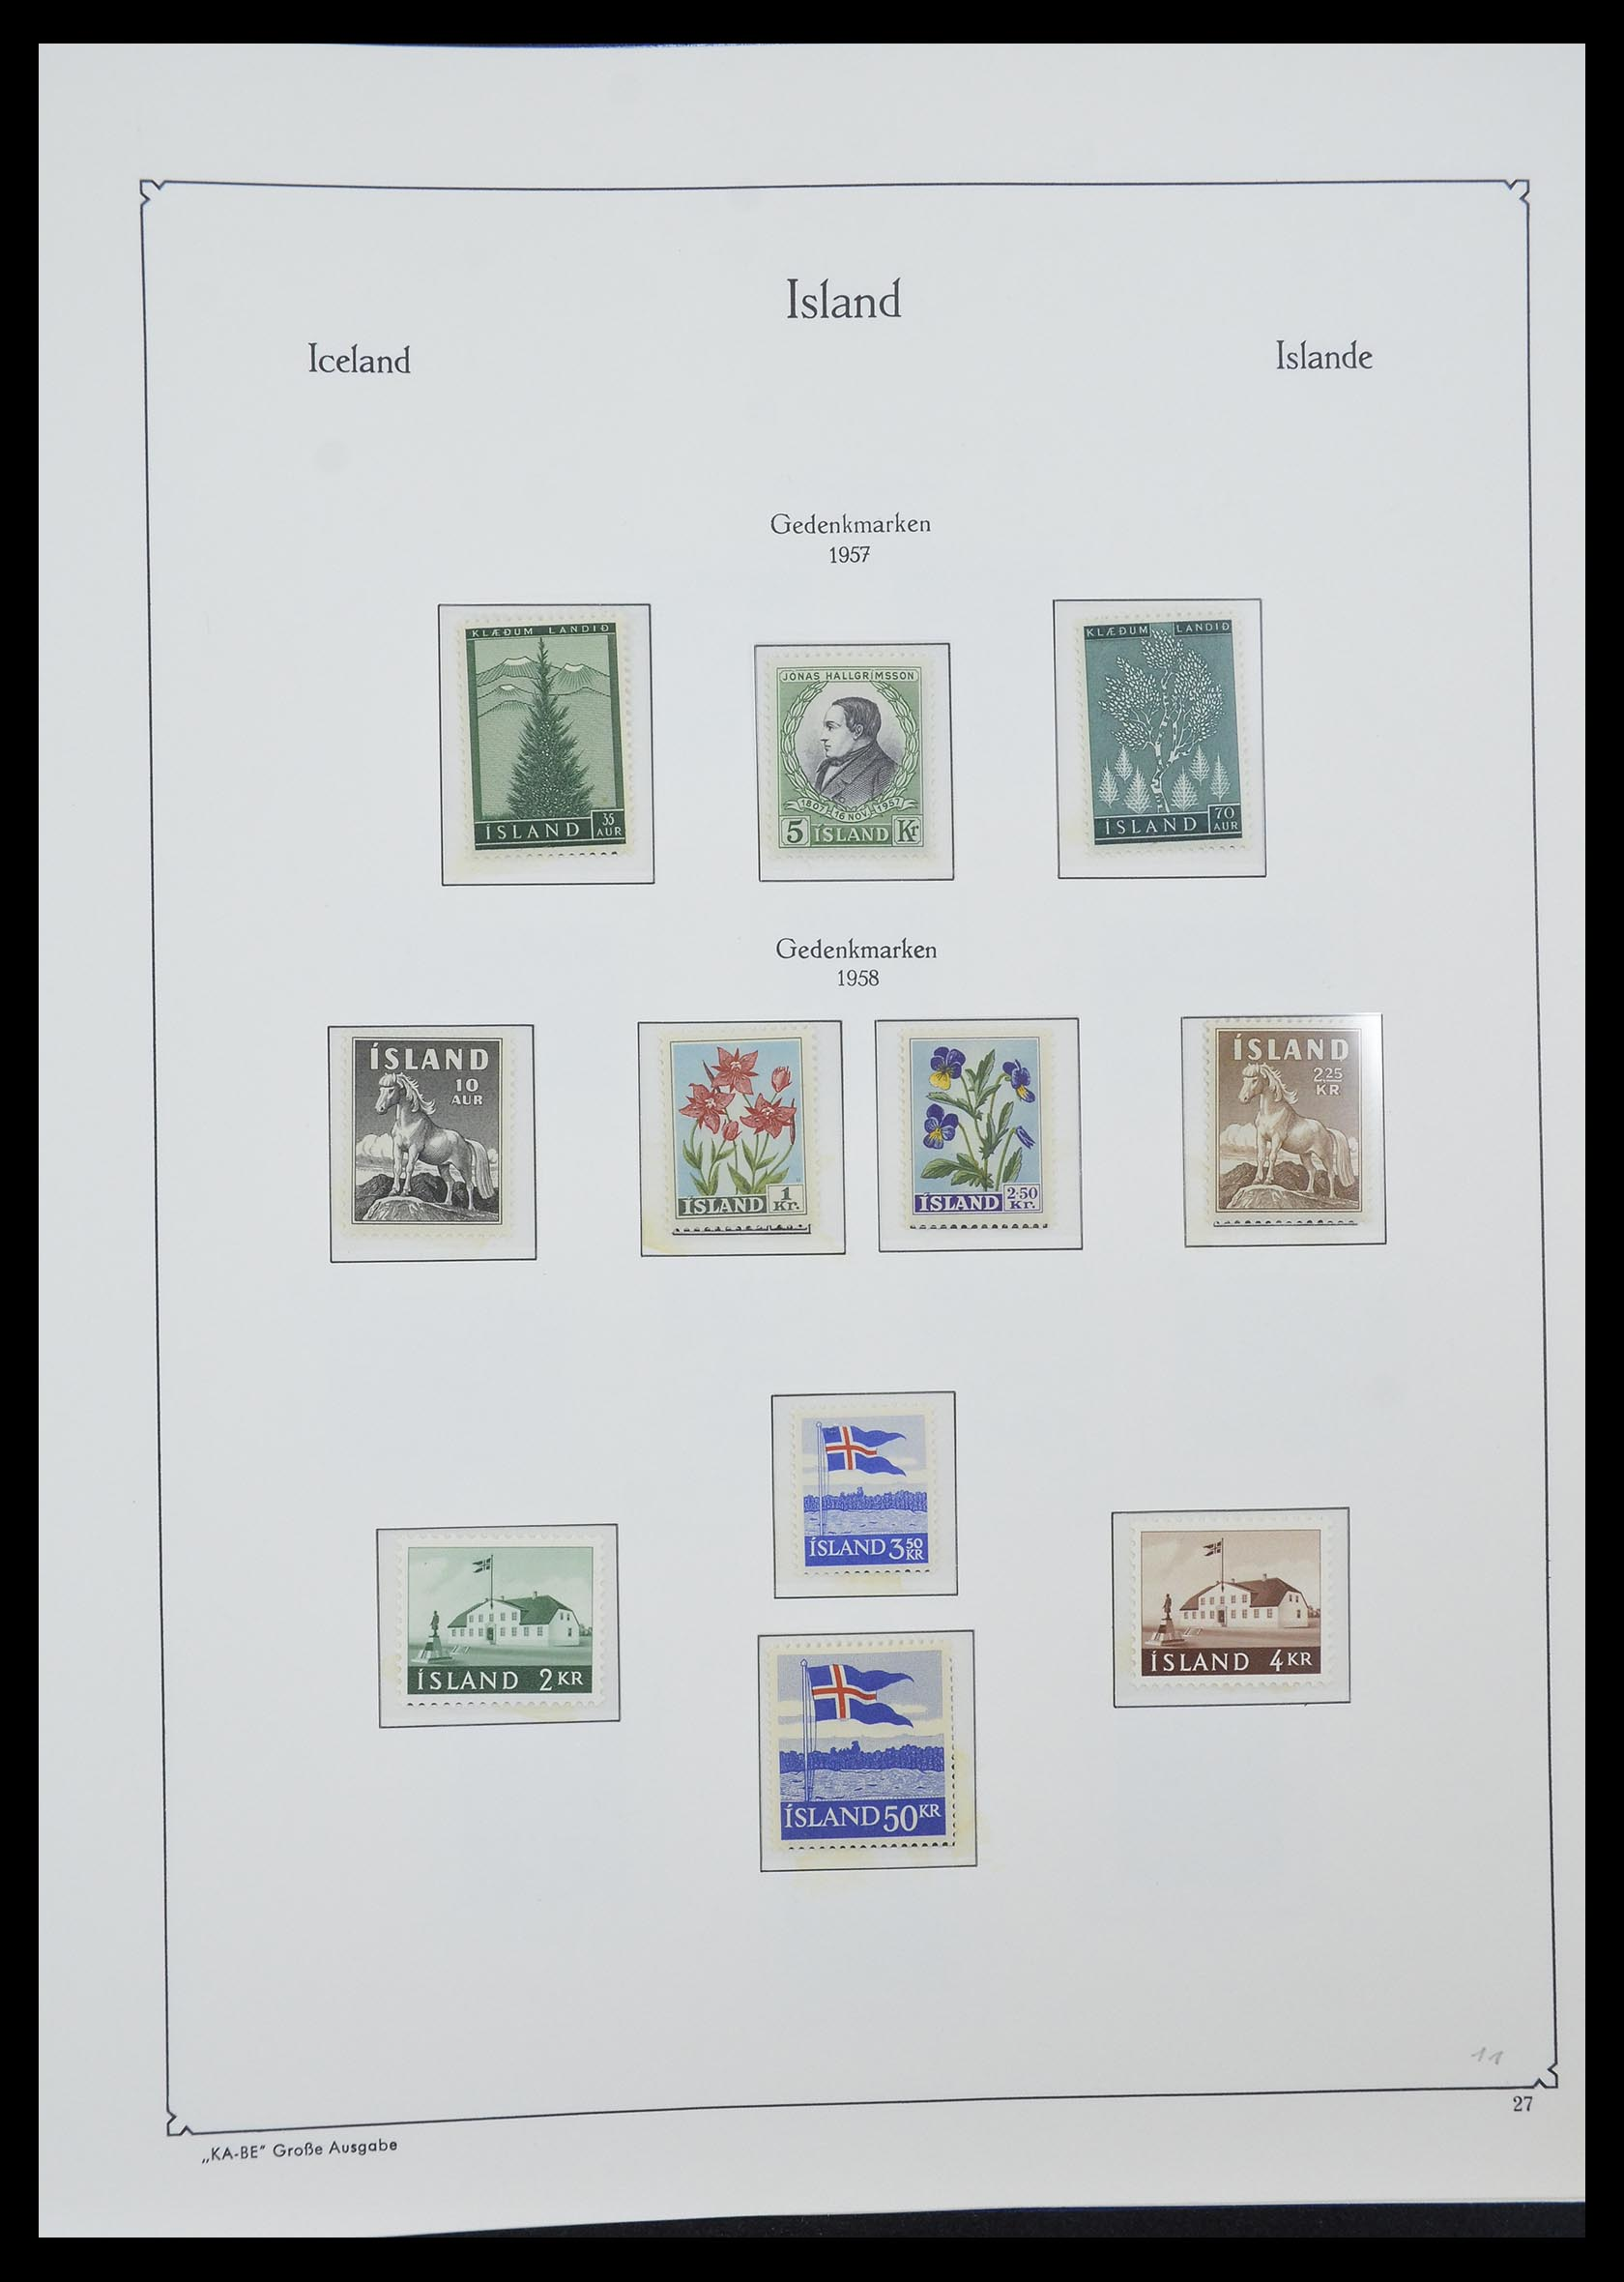 33185 010 - Postzegelverzameling 33184 Finland 1856-1990.